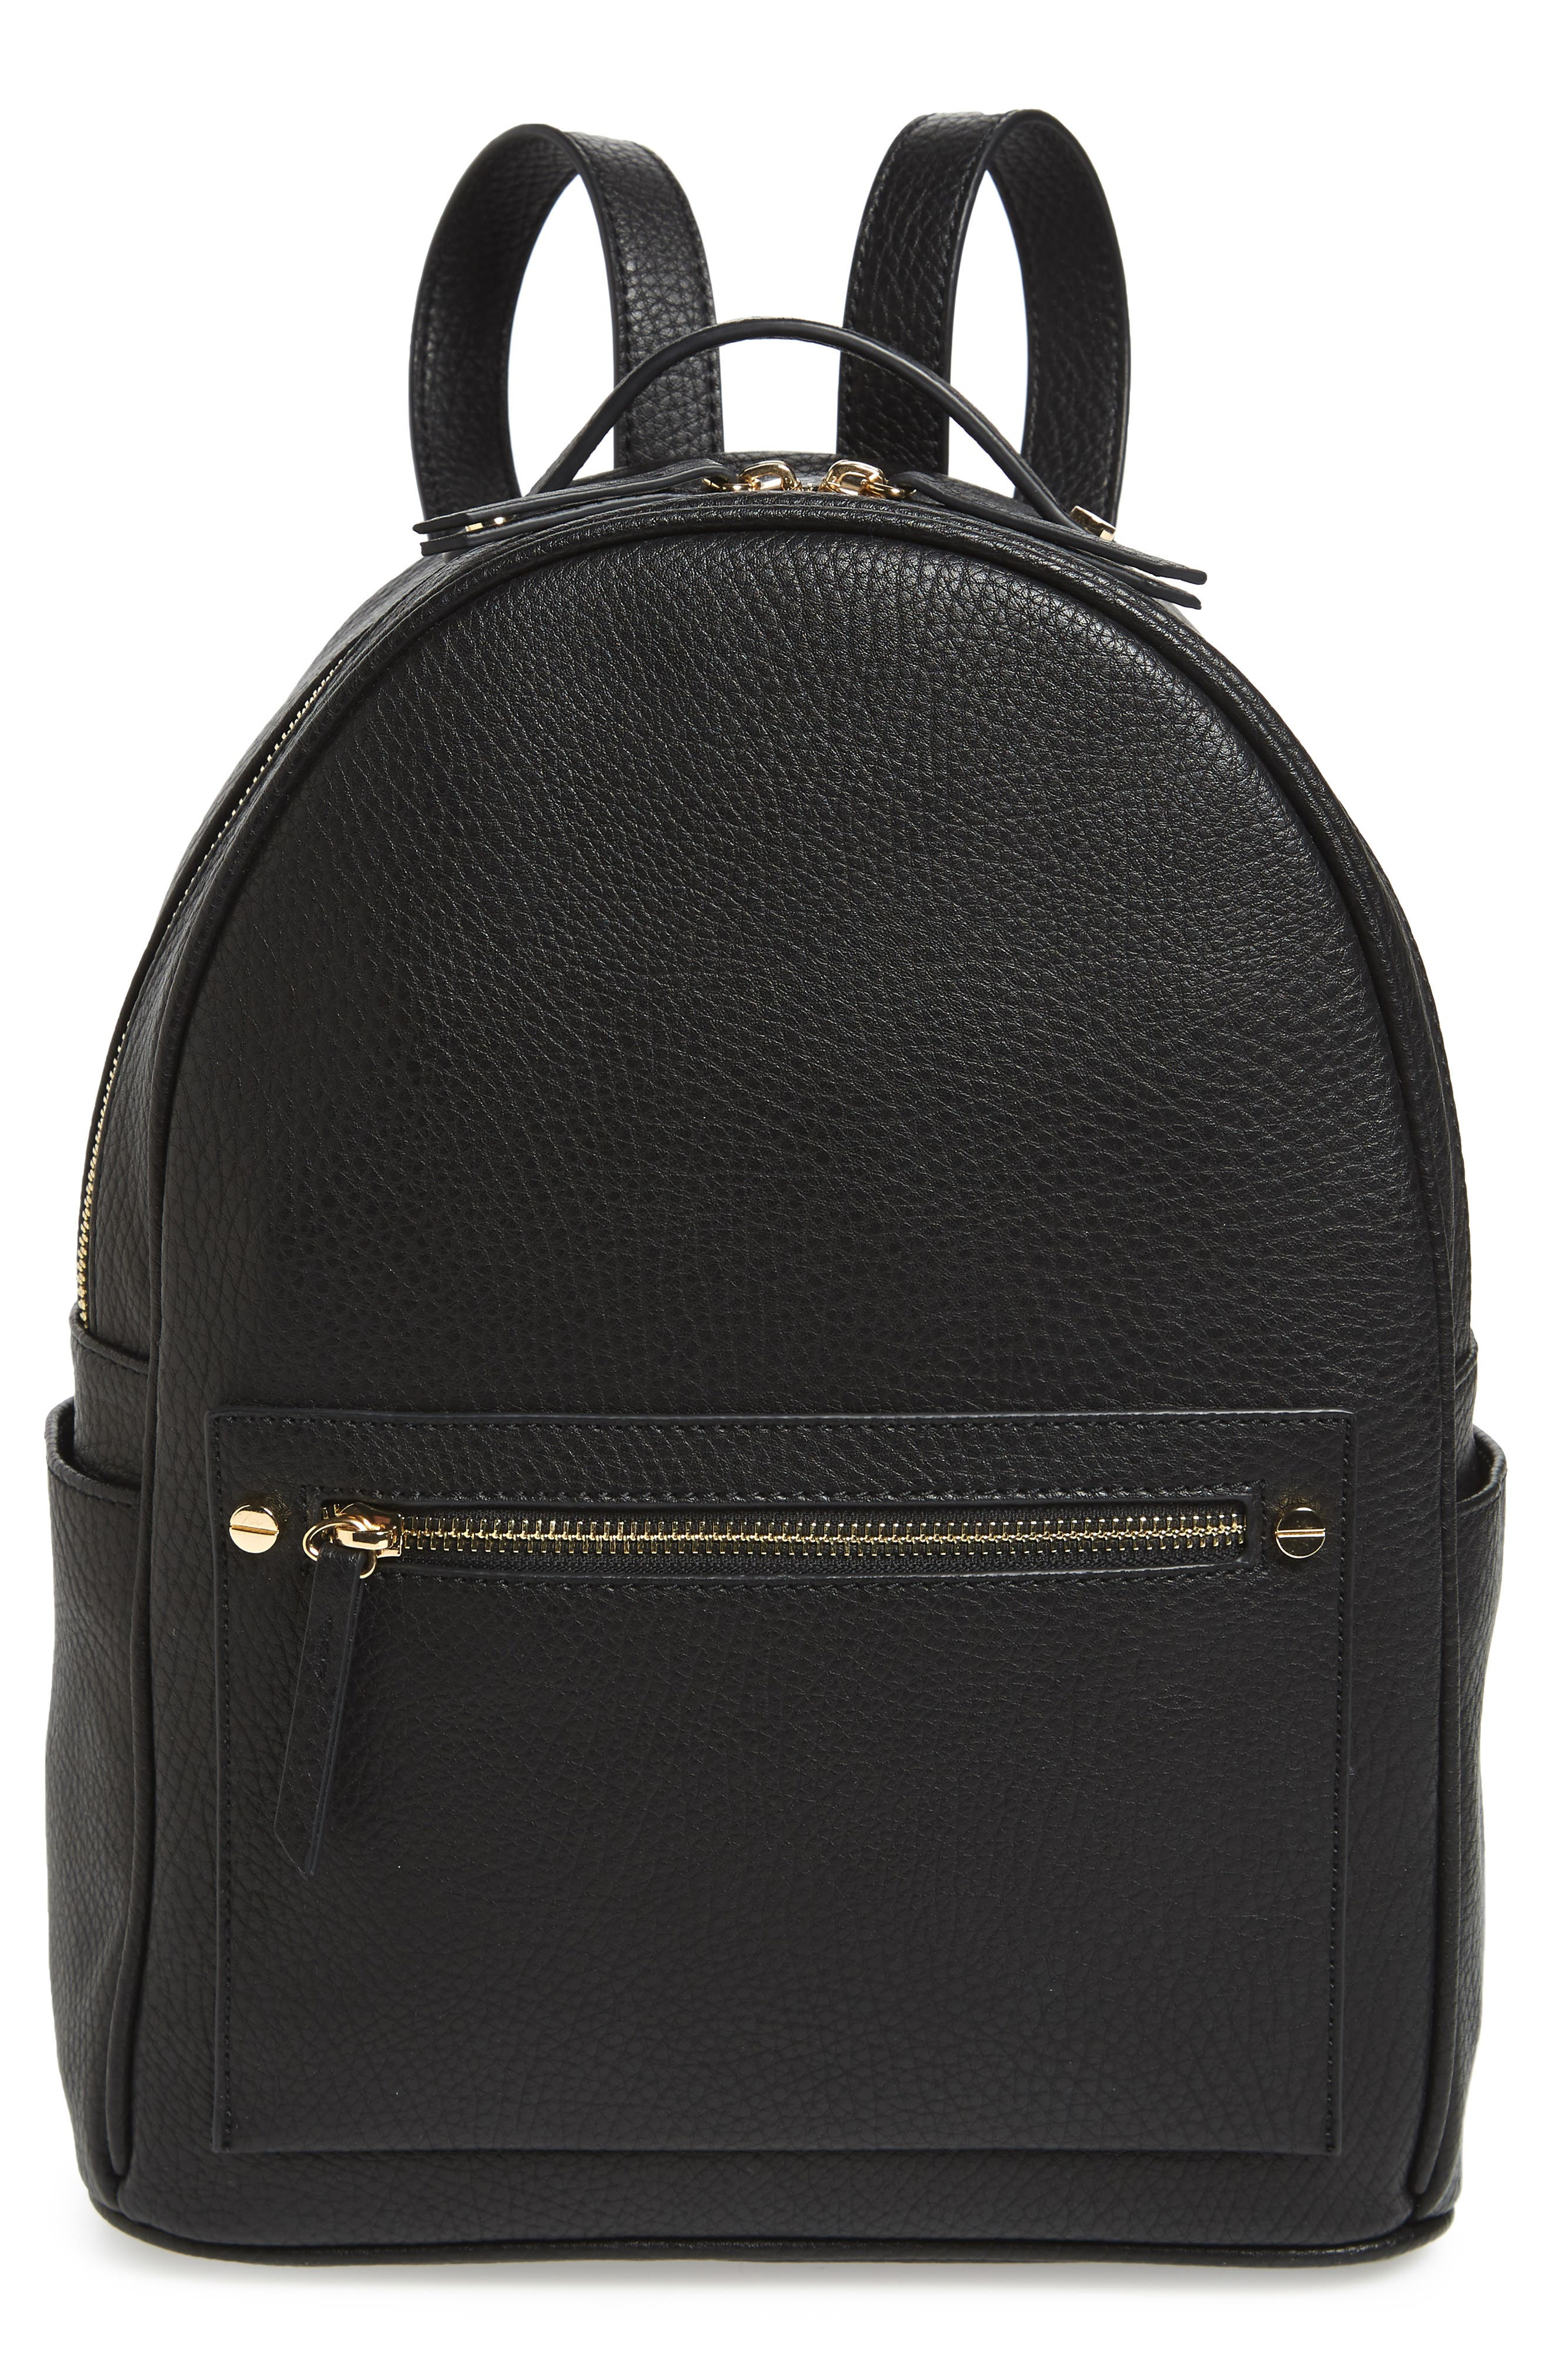 Mali + Lili Madison Vegan Leather Backpack,                             Main thumbnail 1, color,